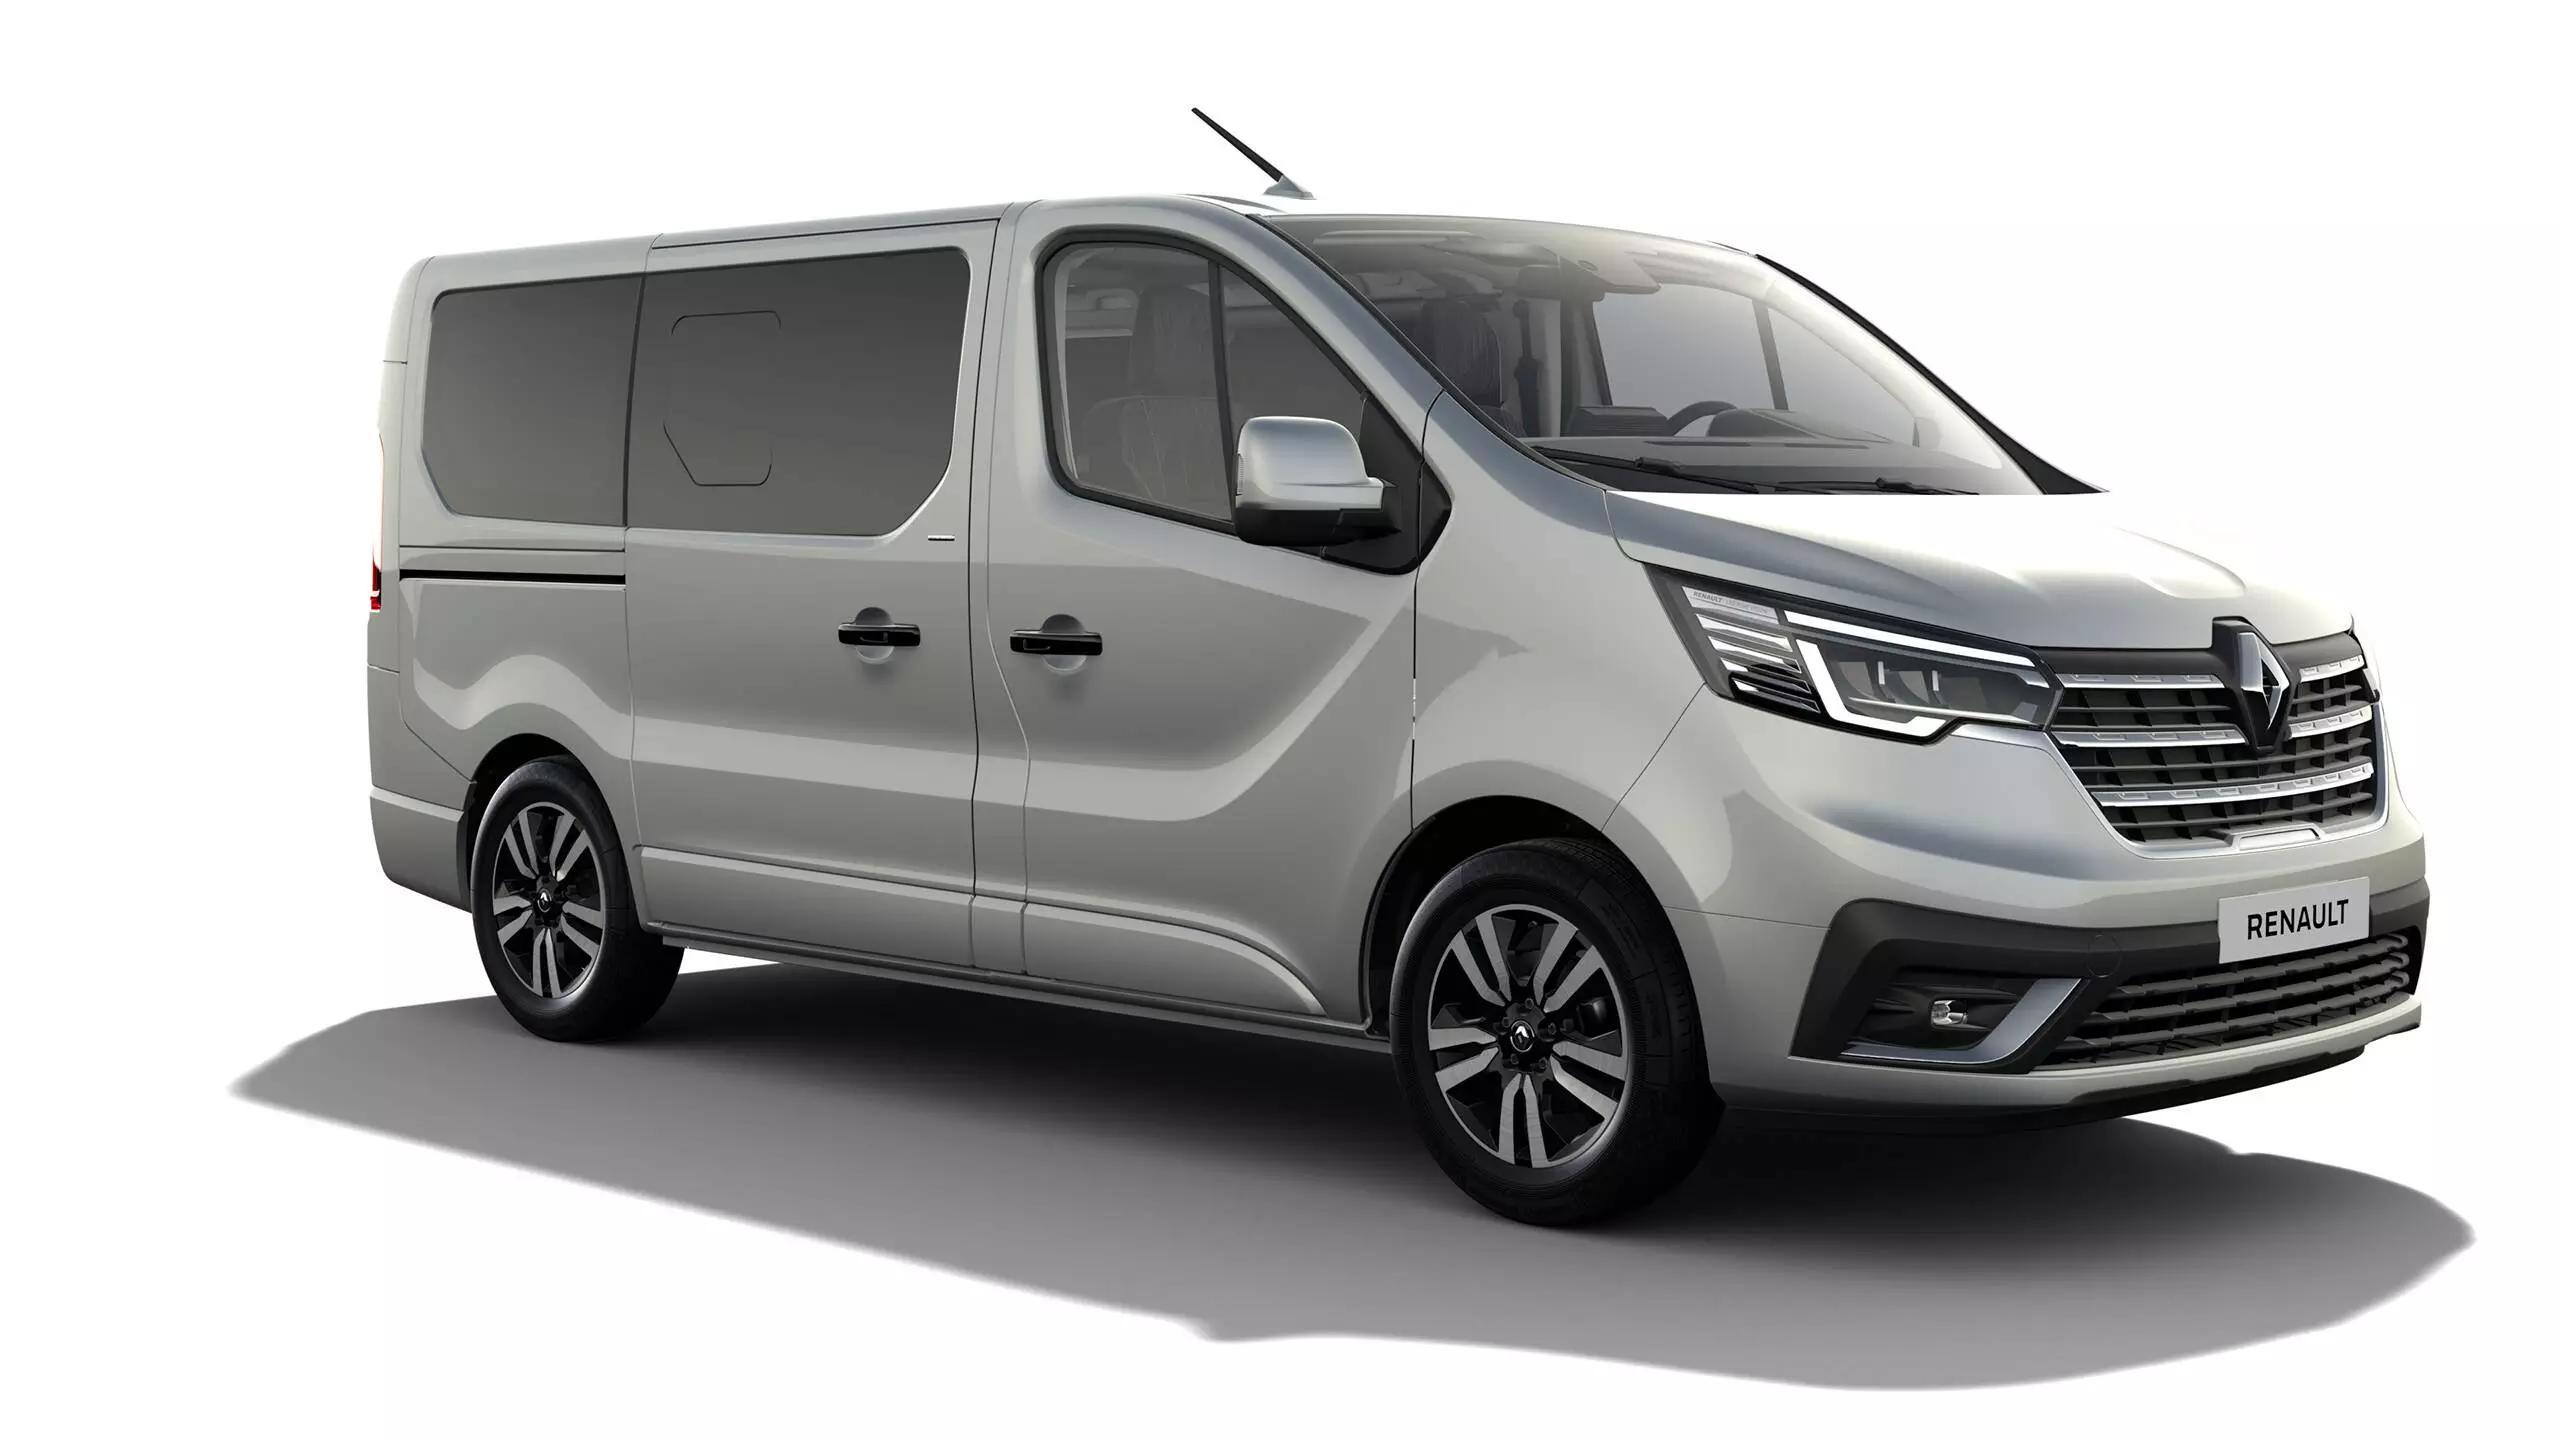 Renault TRAFIC Passenger Latest Offers